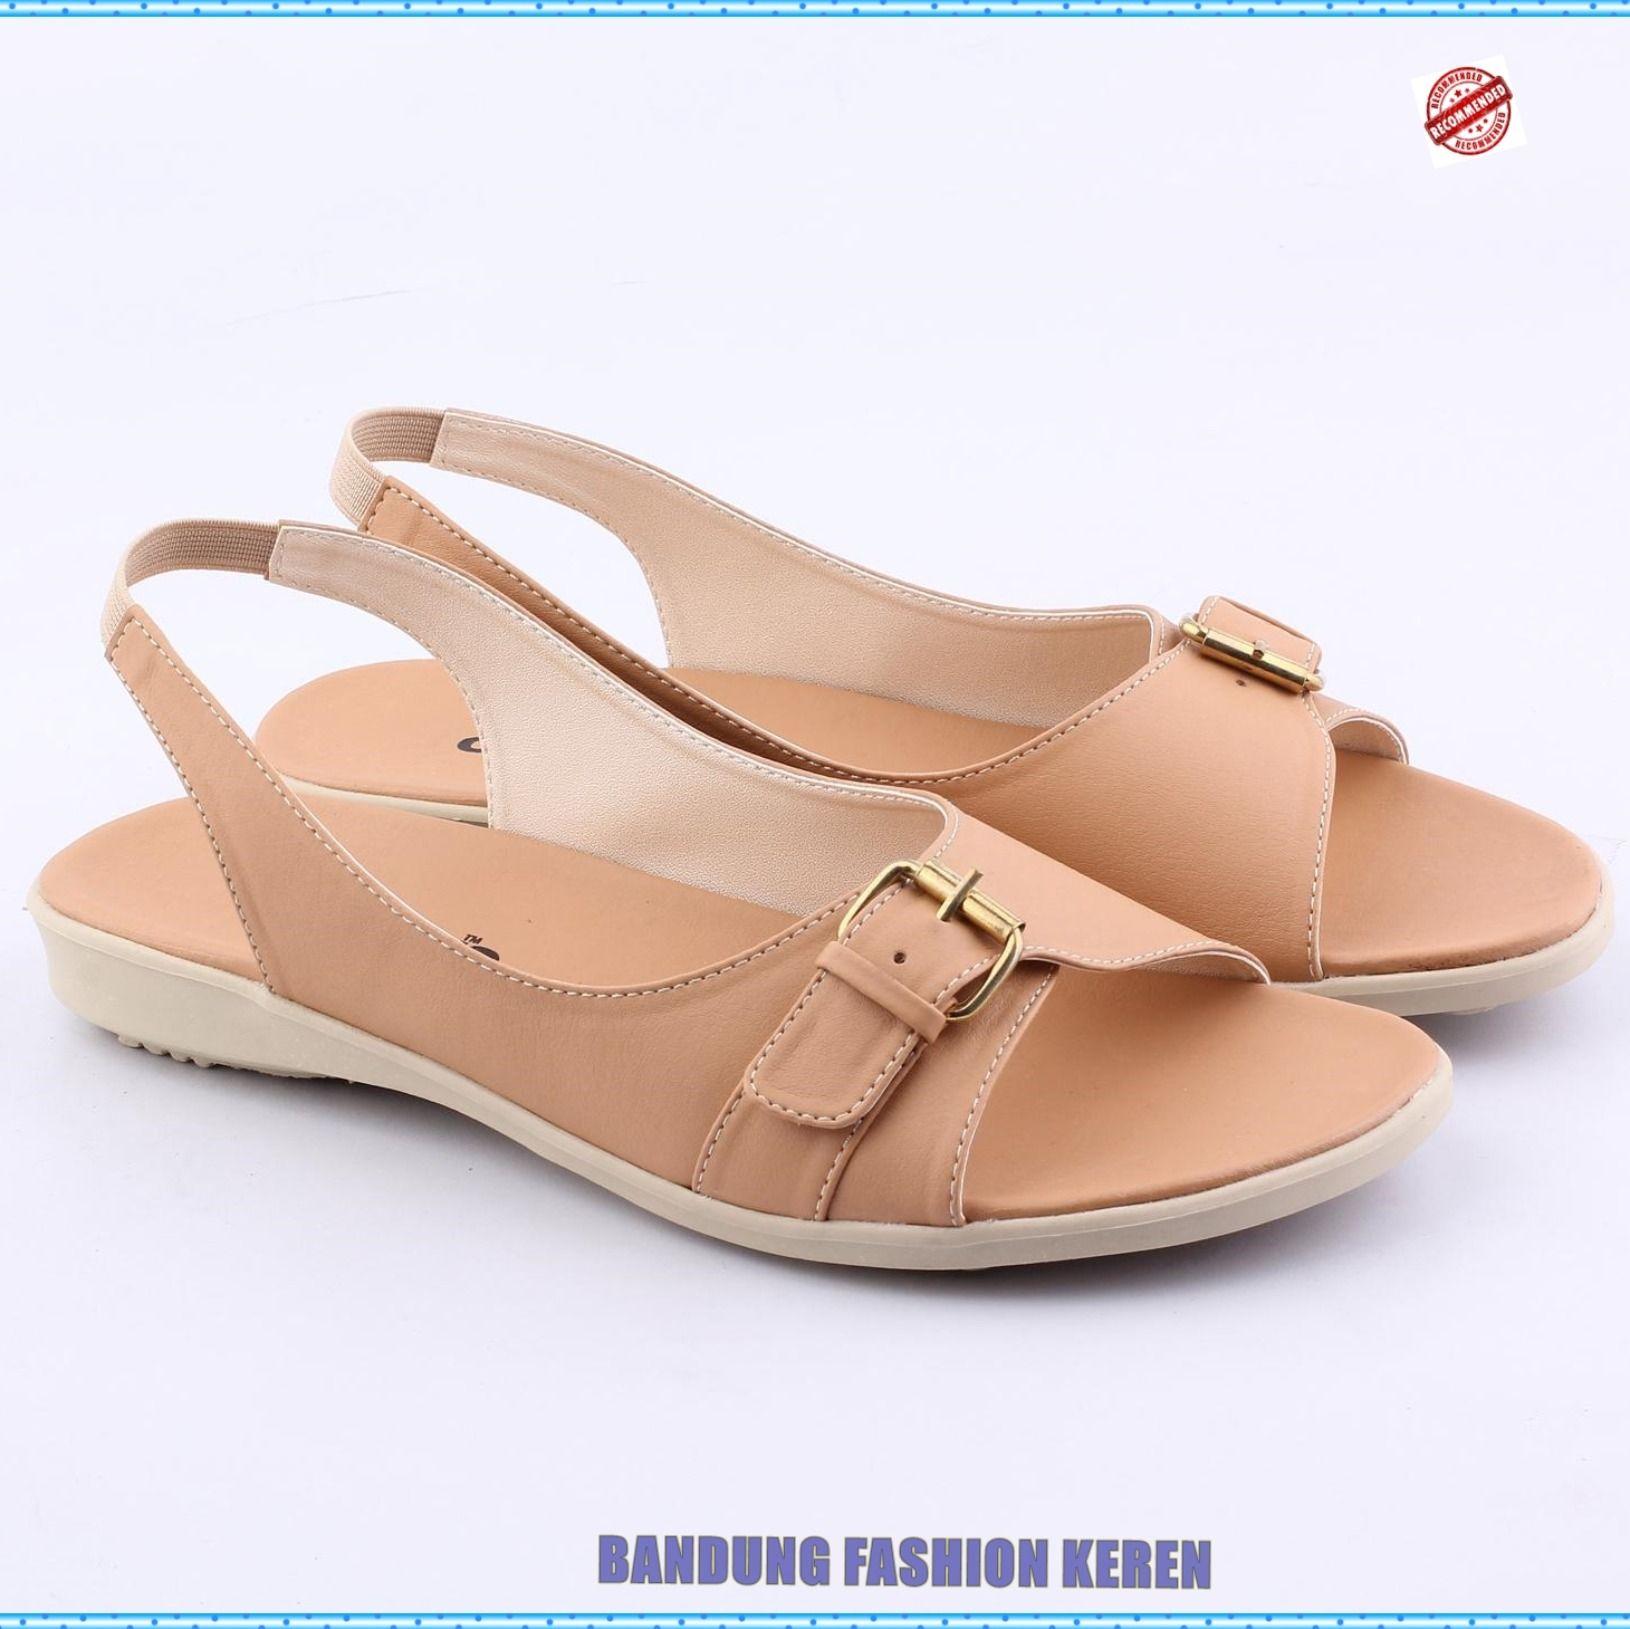 Sandal Casual Wanita Ry 053 Produk Fashion Handmade Terbaik 100